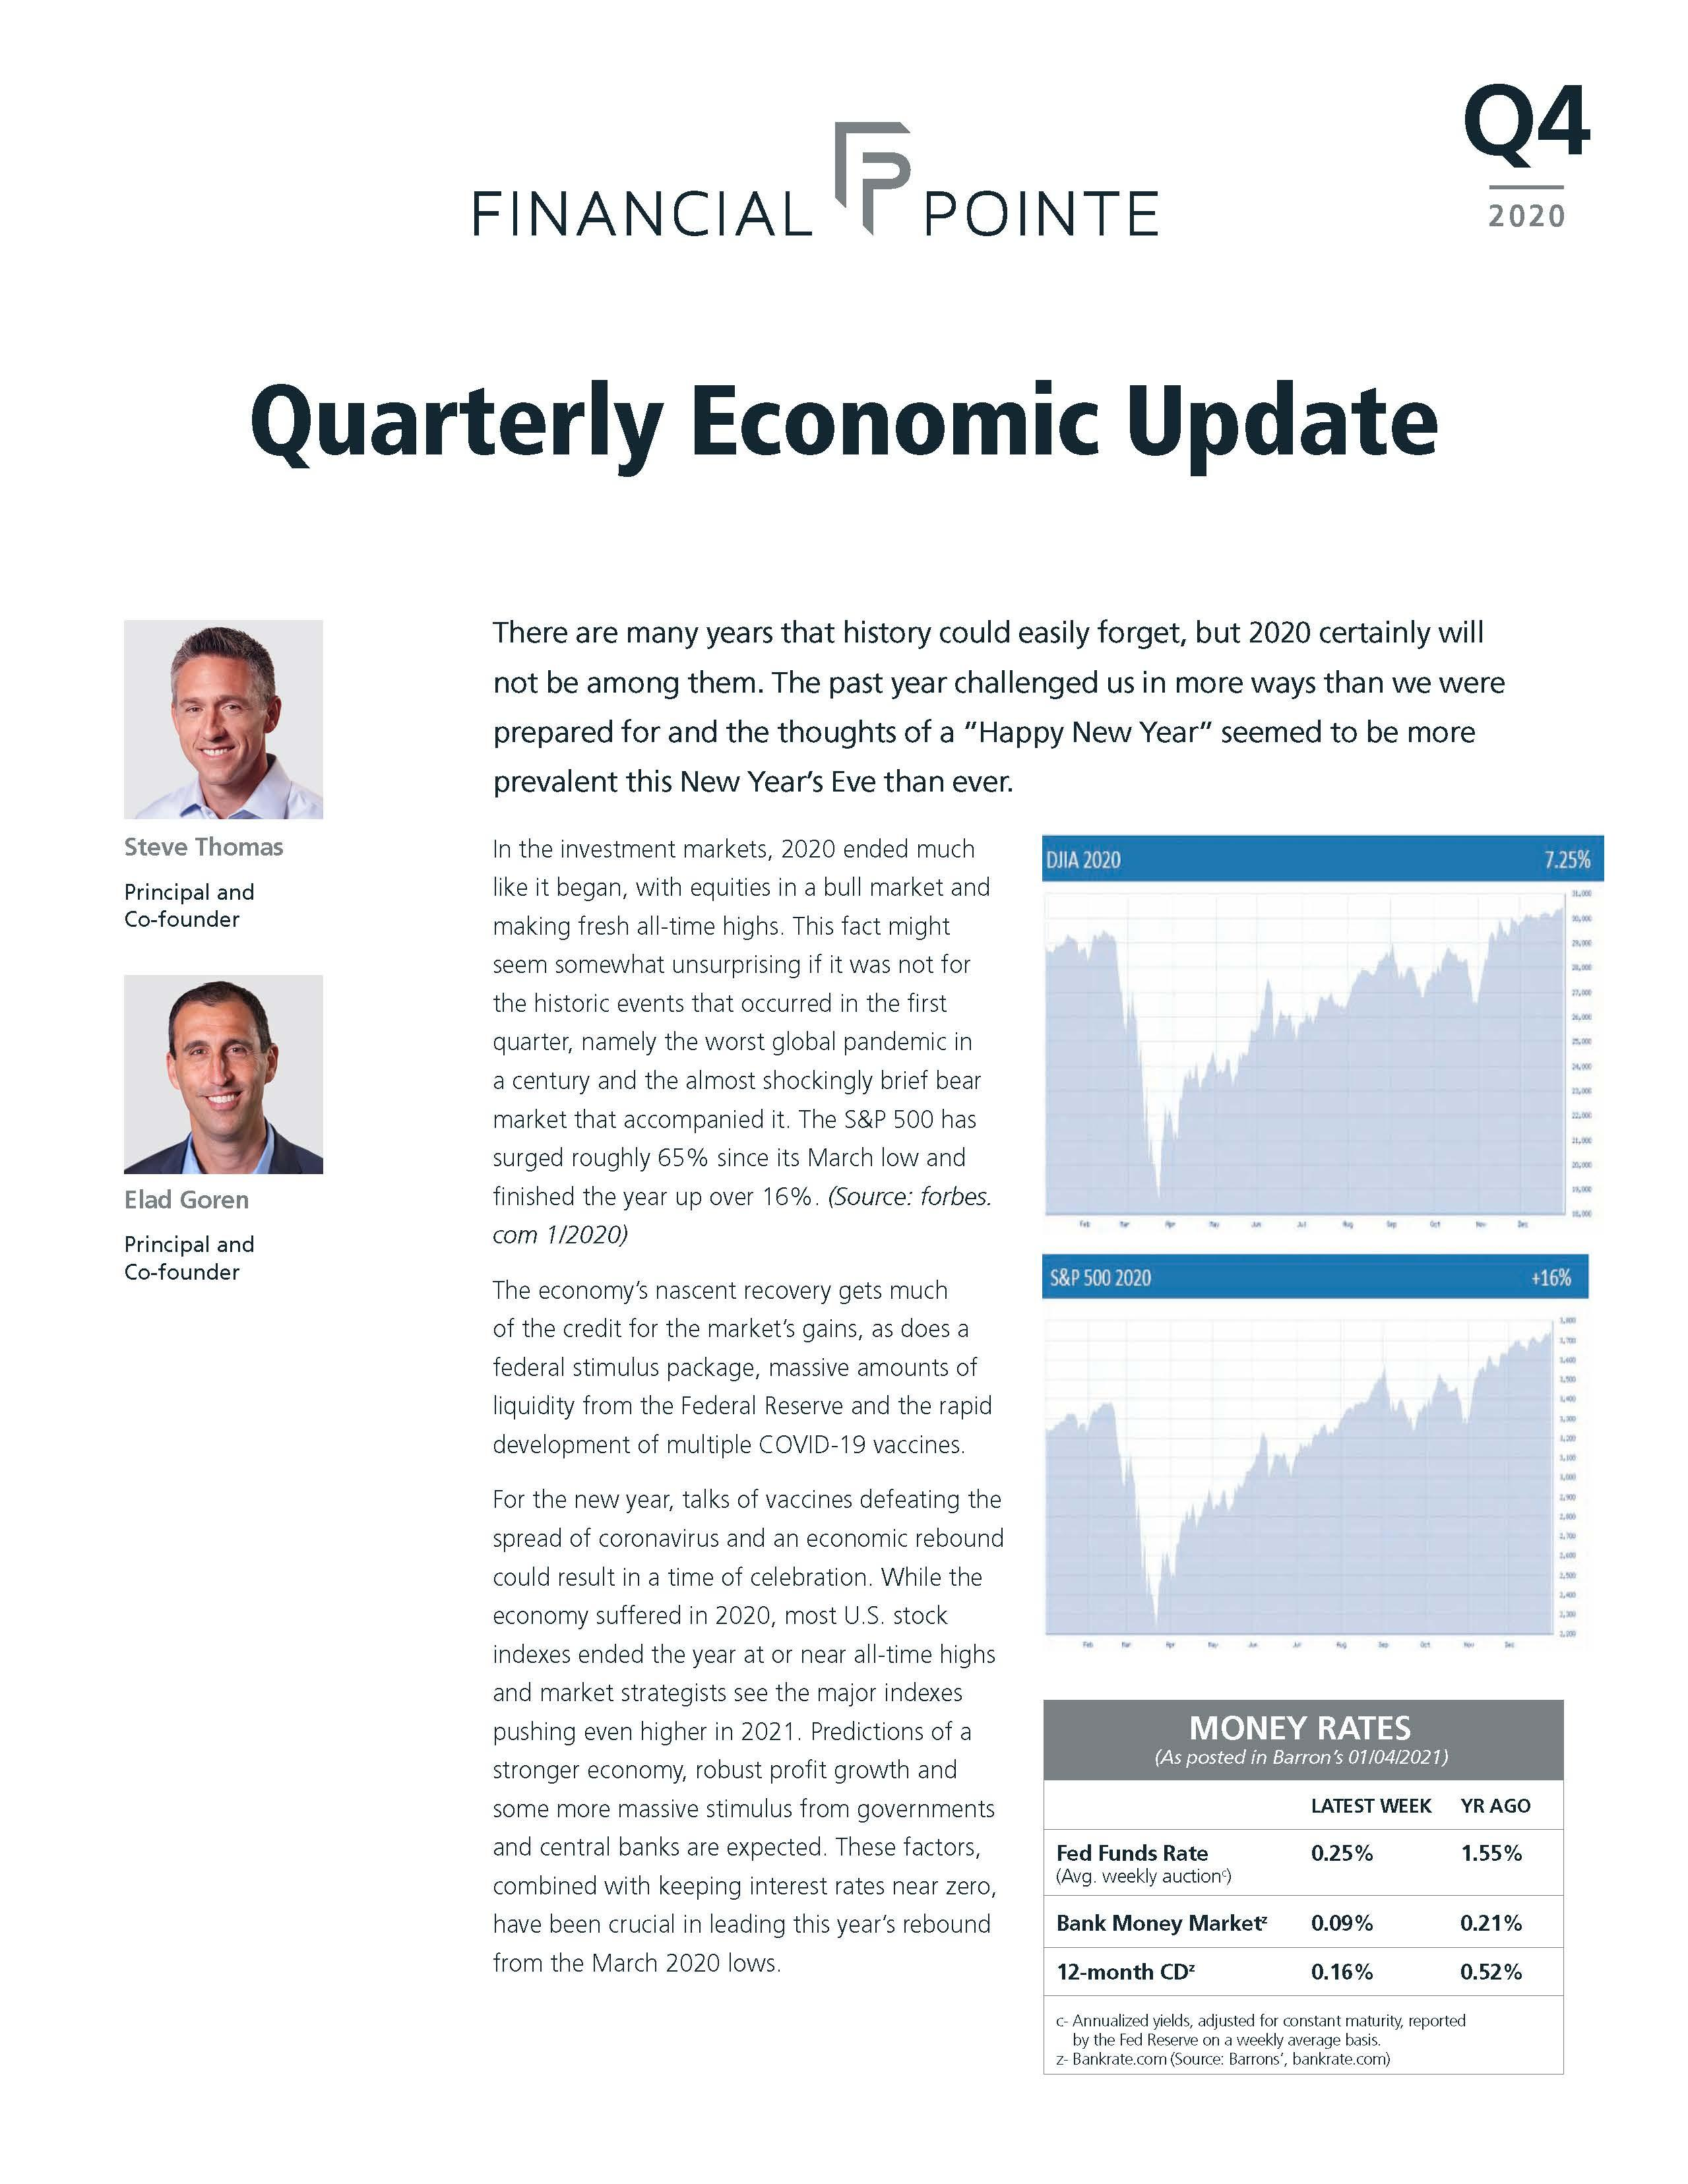 Quarterly Economic Update Q4 2020 Thumbnail